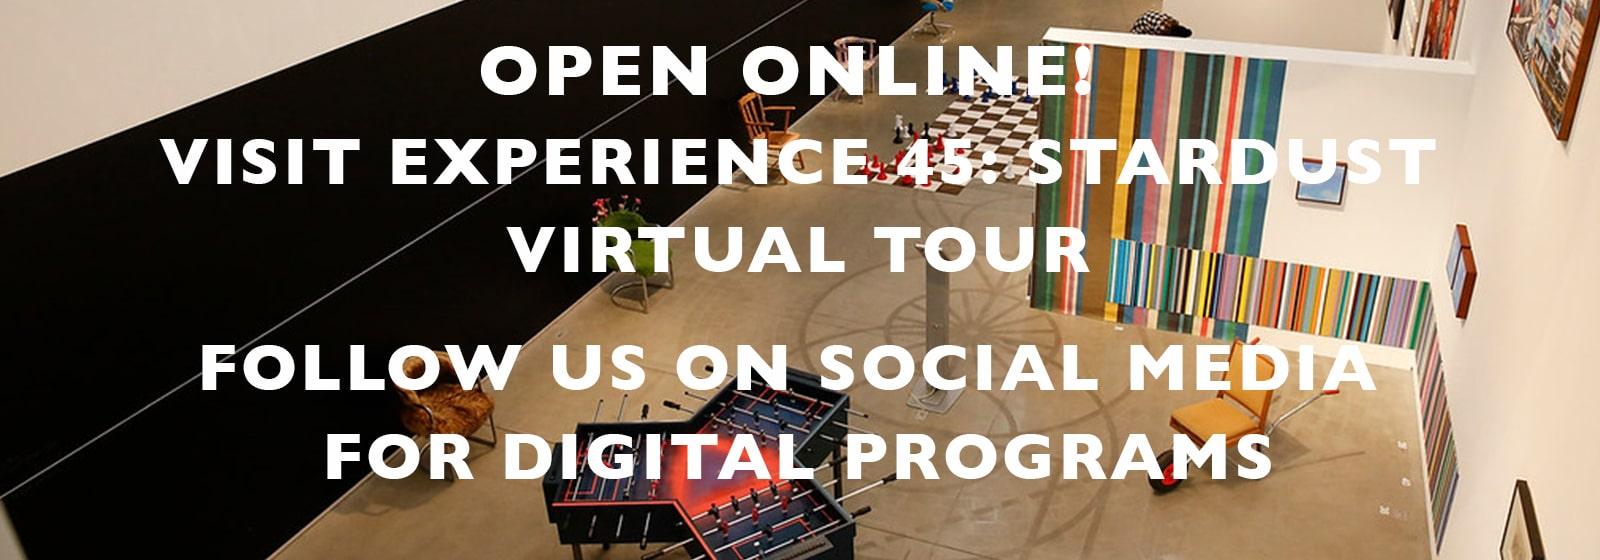 OPEN ONLINE VISIT EXPERIENCE 45 STARDUST VIRTUAL TOUR 3